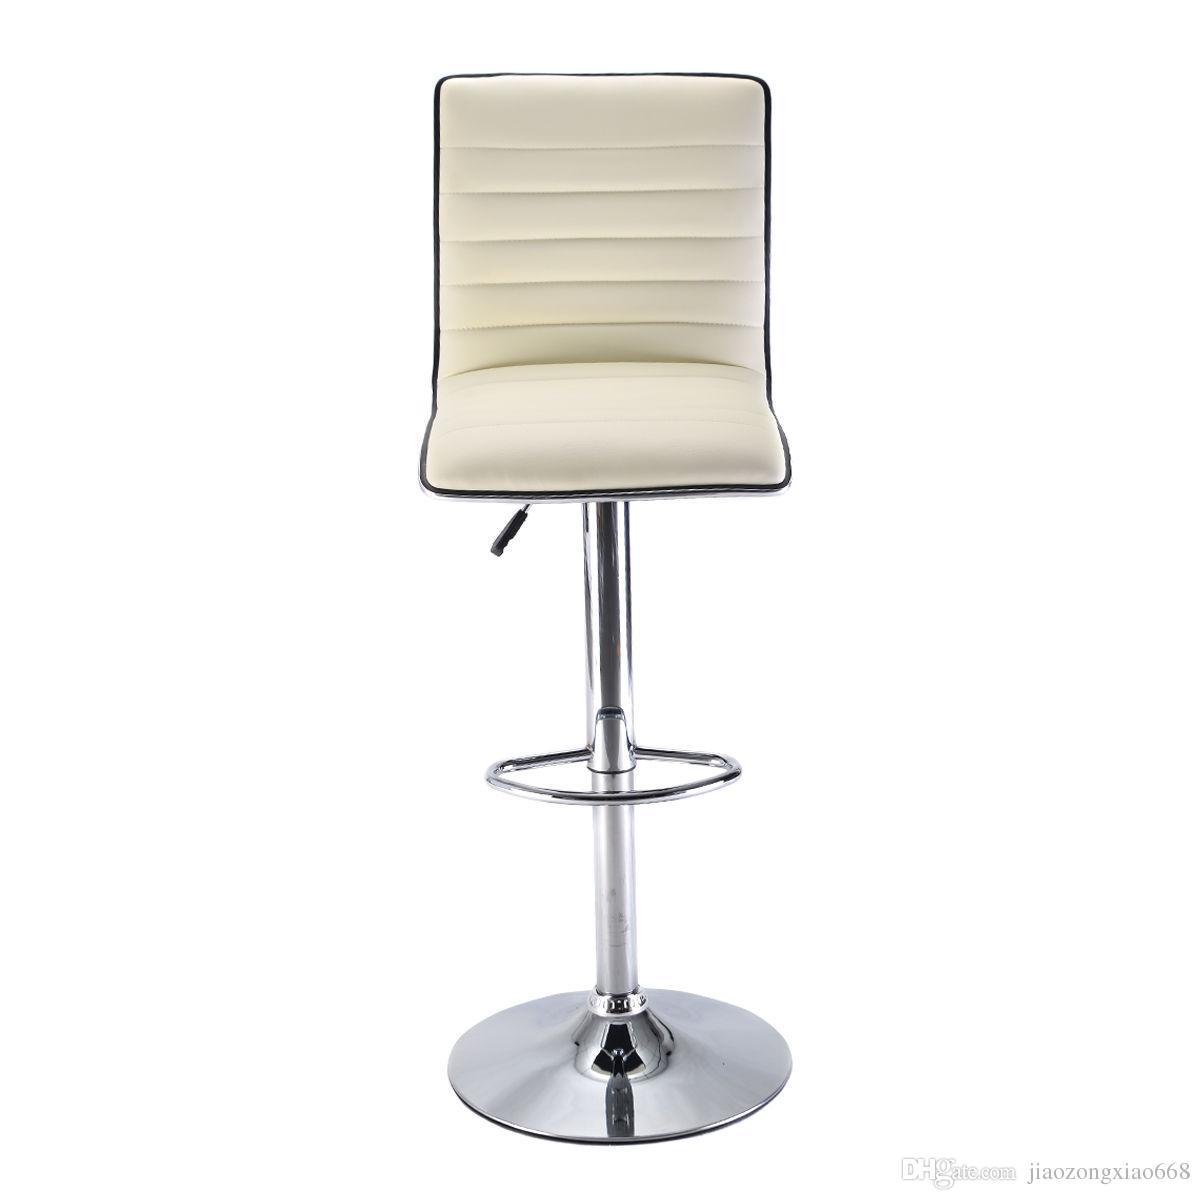 Best Swivel Bar Stool Modern Adjustable Height Hydraulic  : 1 pc swivel bar stool modern adjustable height from www.dhgate.com size 1200 x 1200 jpeg 37kB